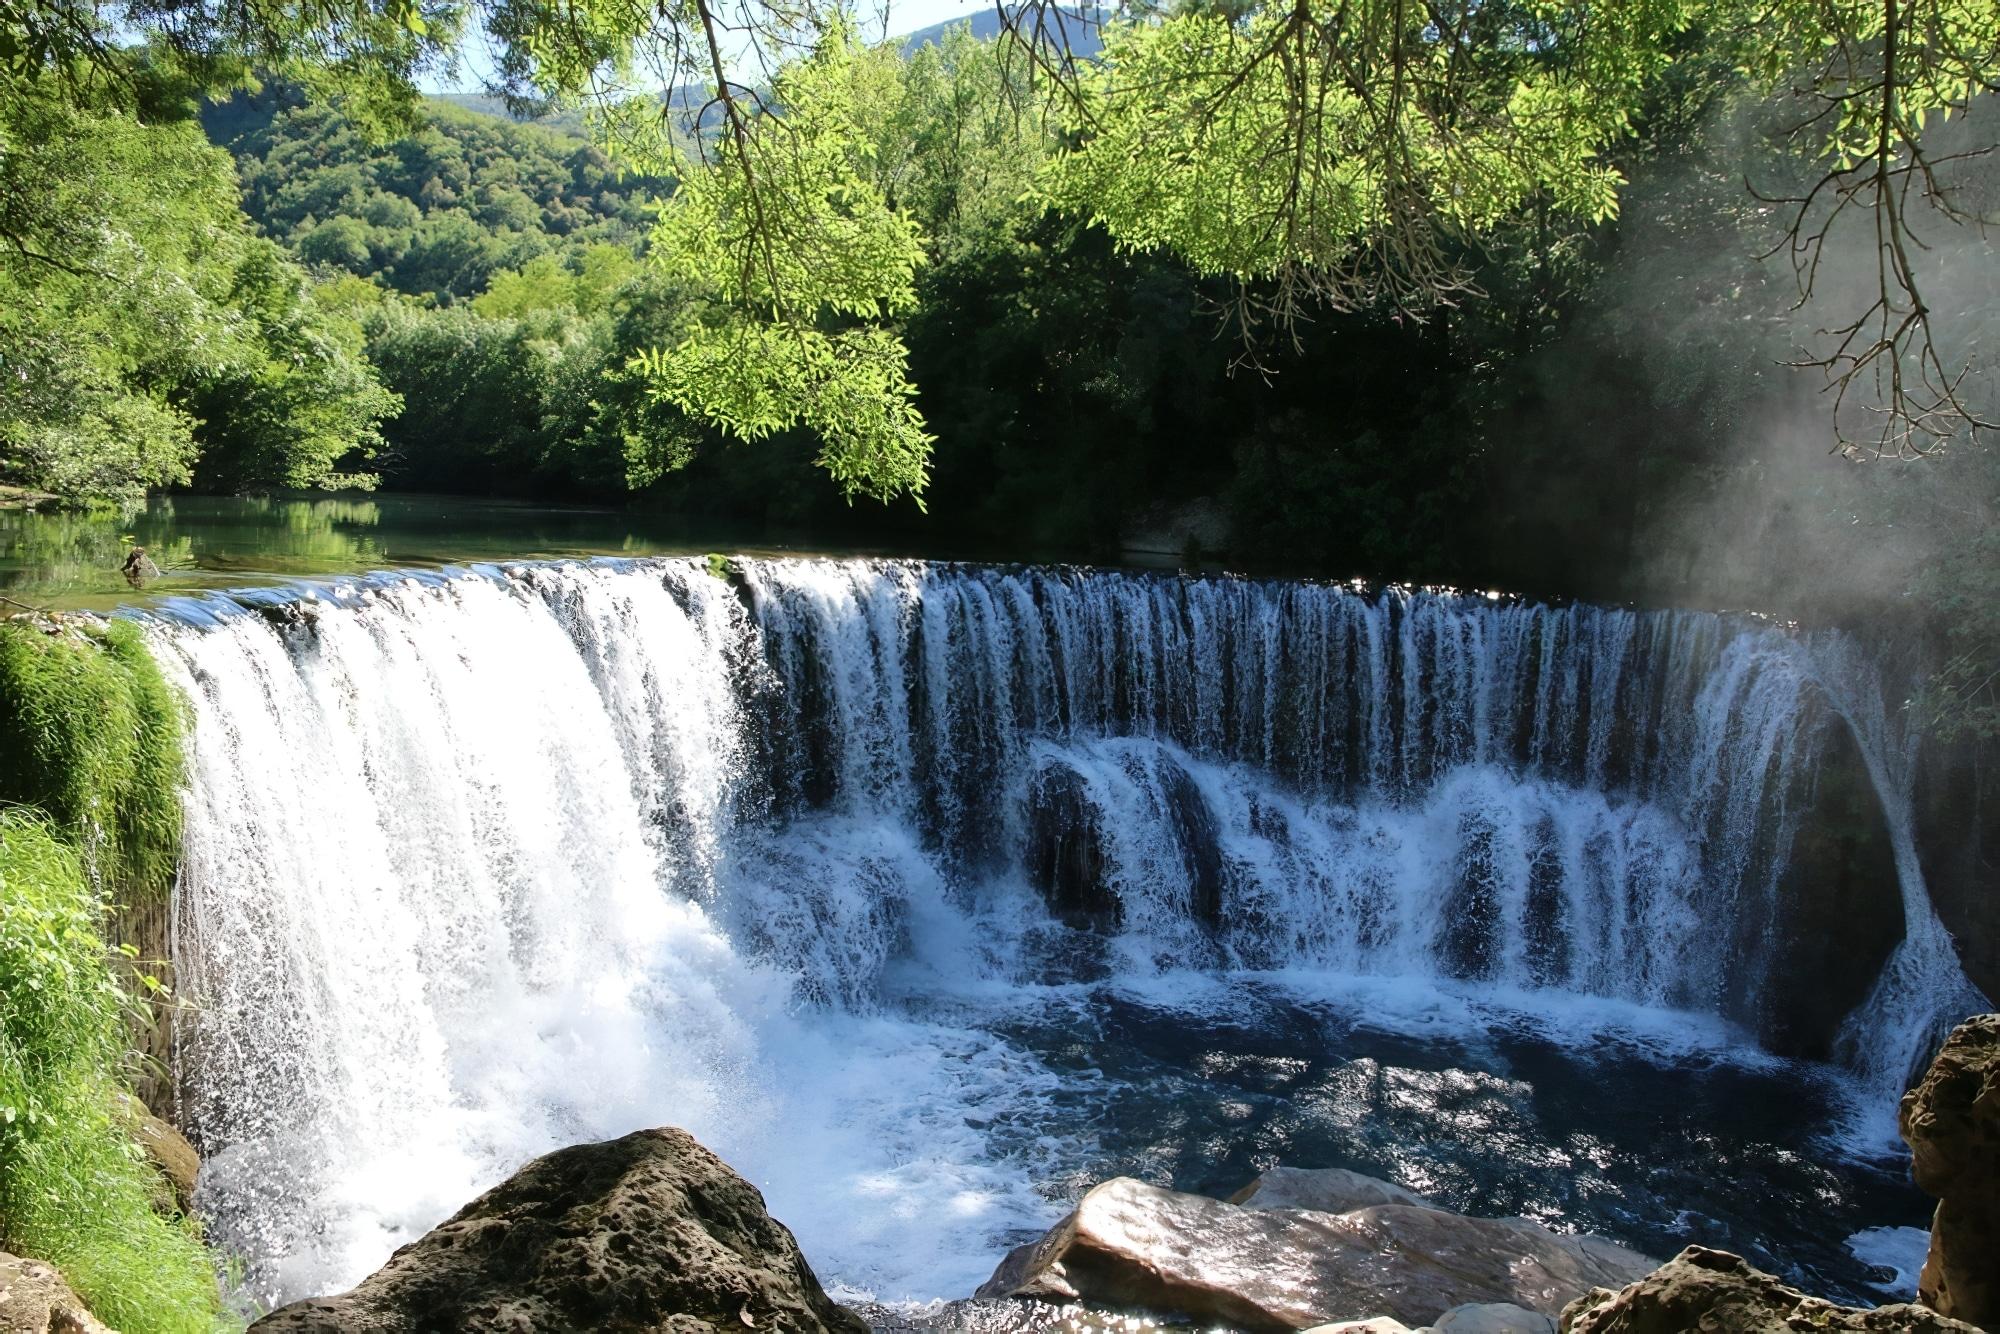 parc national France